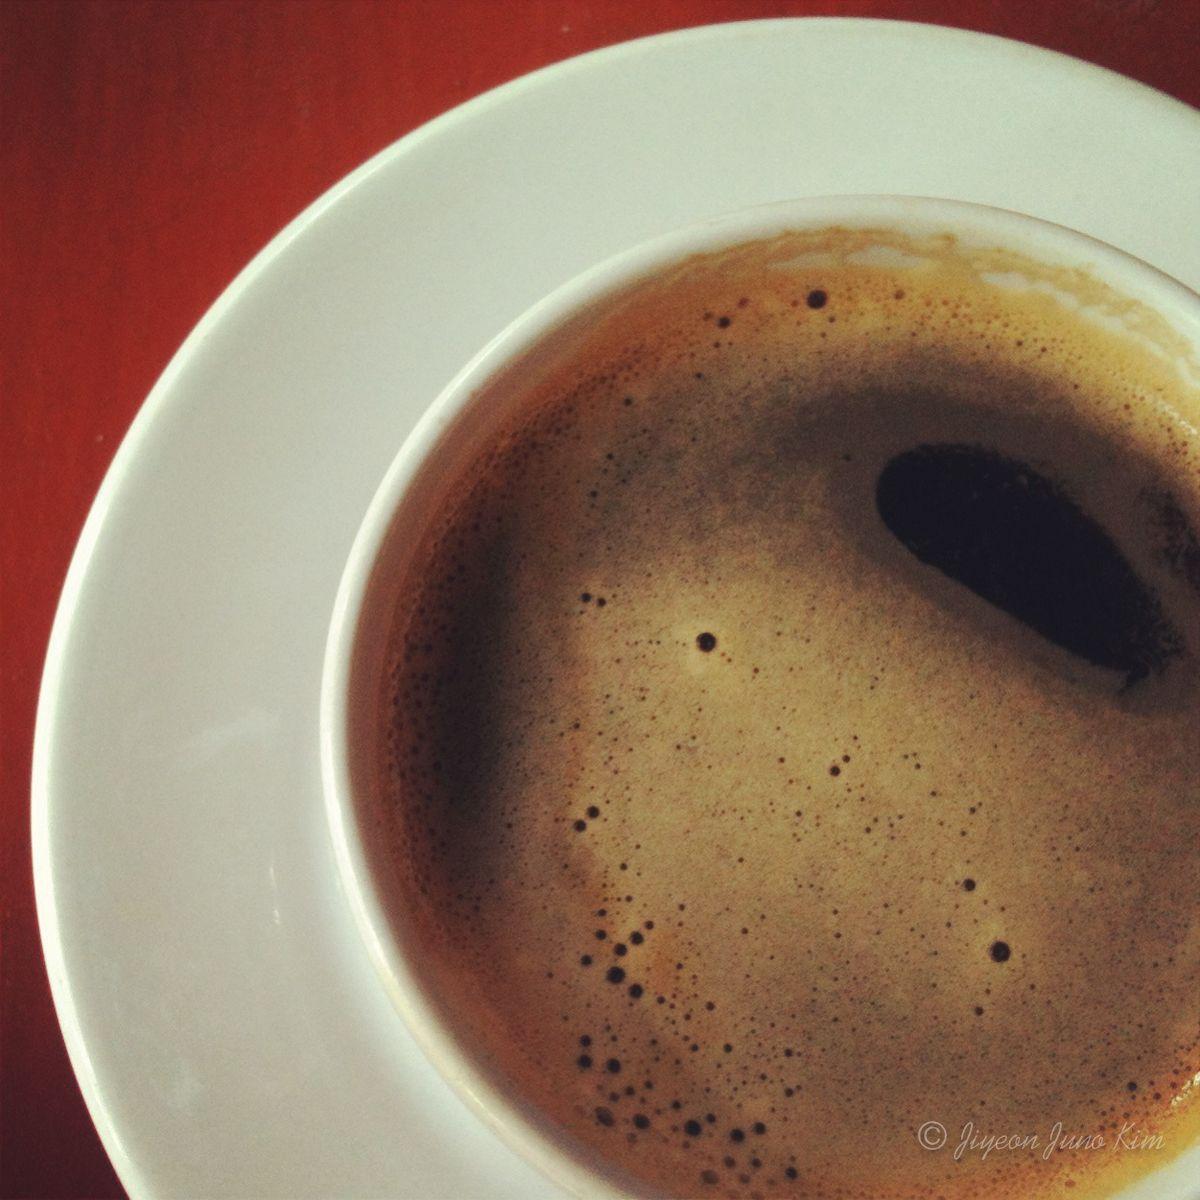 Organic coffee at Finca Argovia